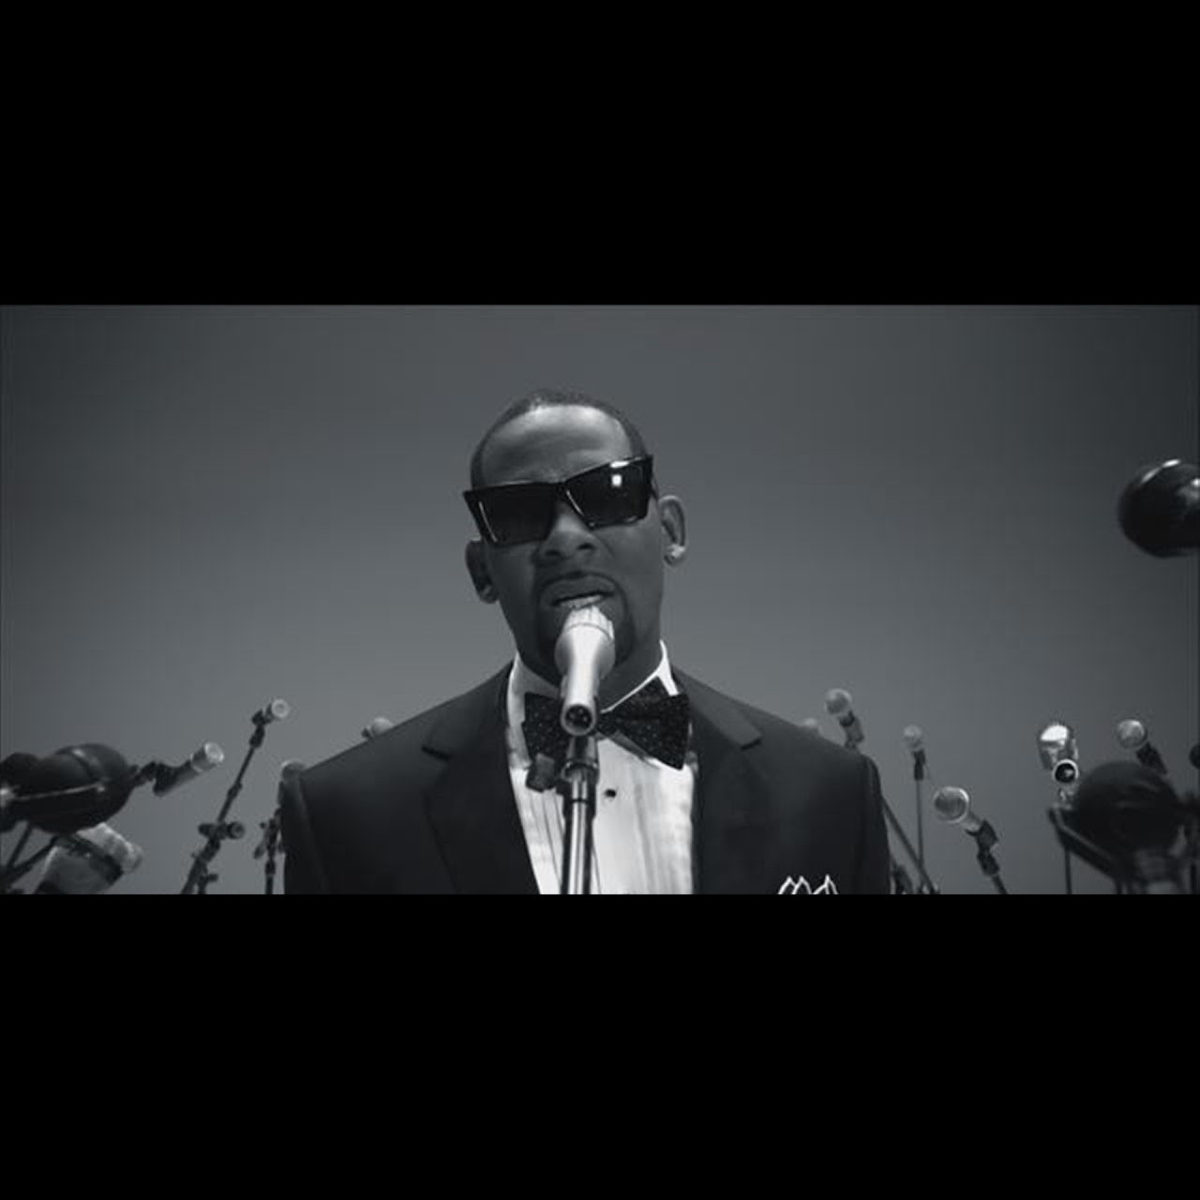 R. Kelly - When A Woman Loves (Thumbnail)